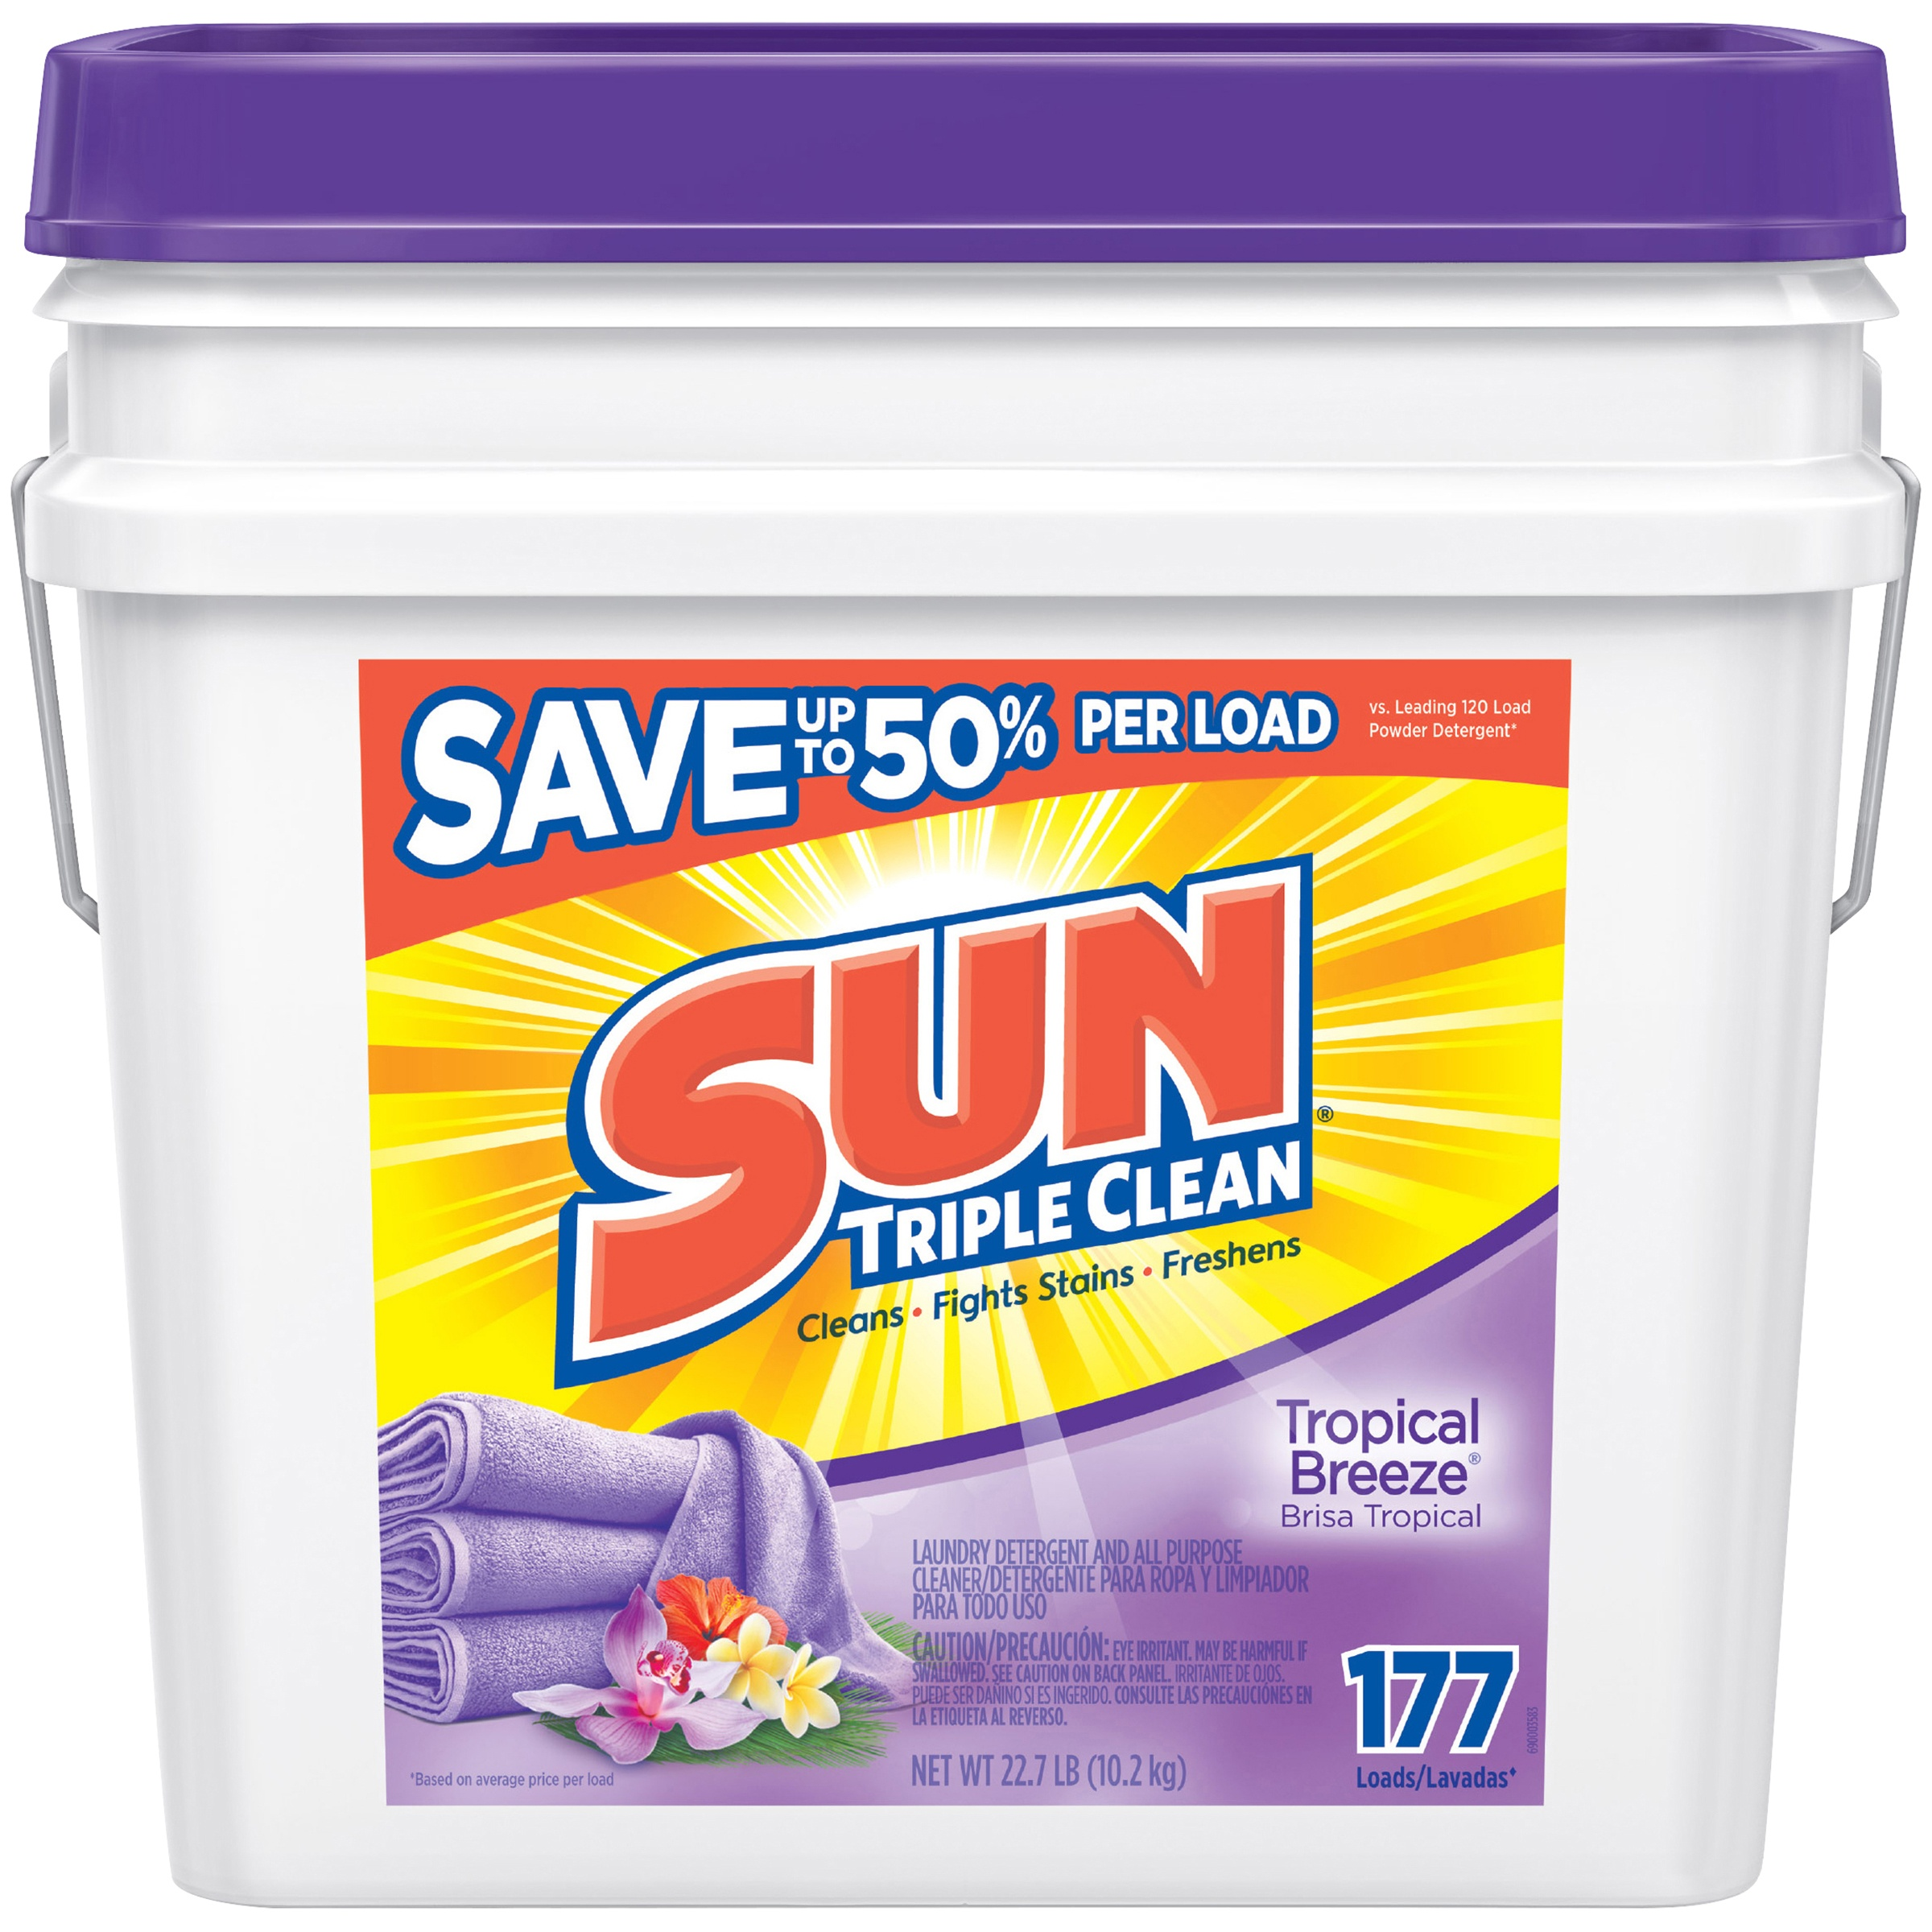 Sun 174 Triple Clean Tropical Breeze 174 Laundry Detergent Amp All